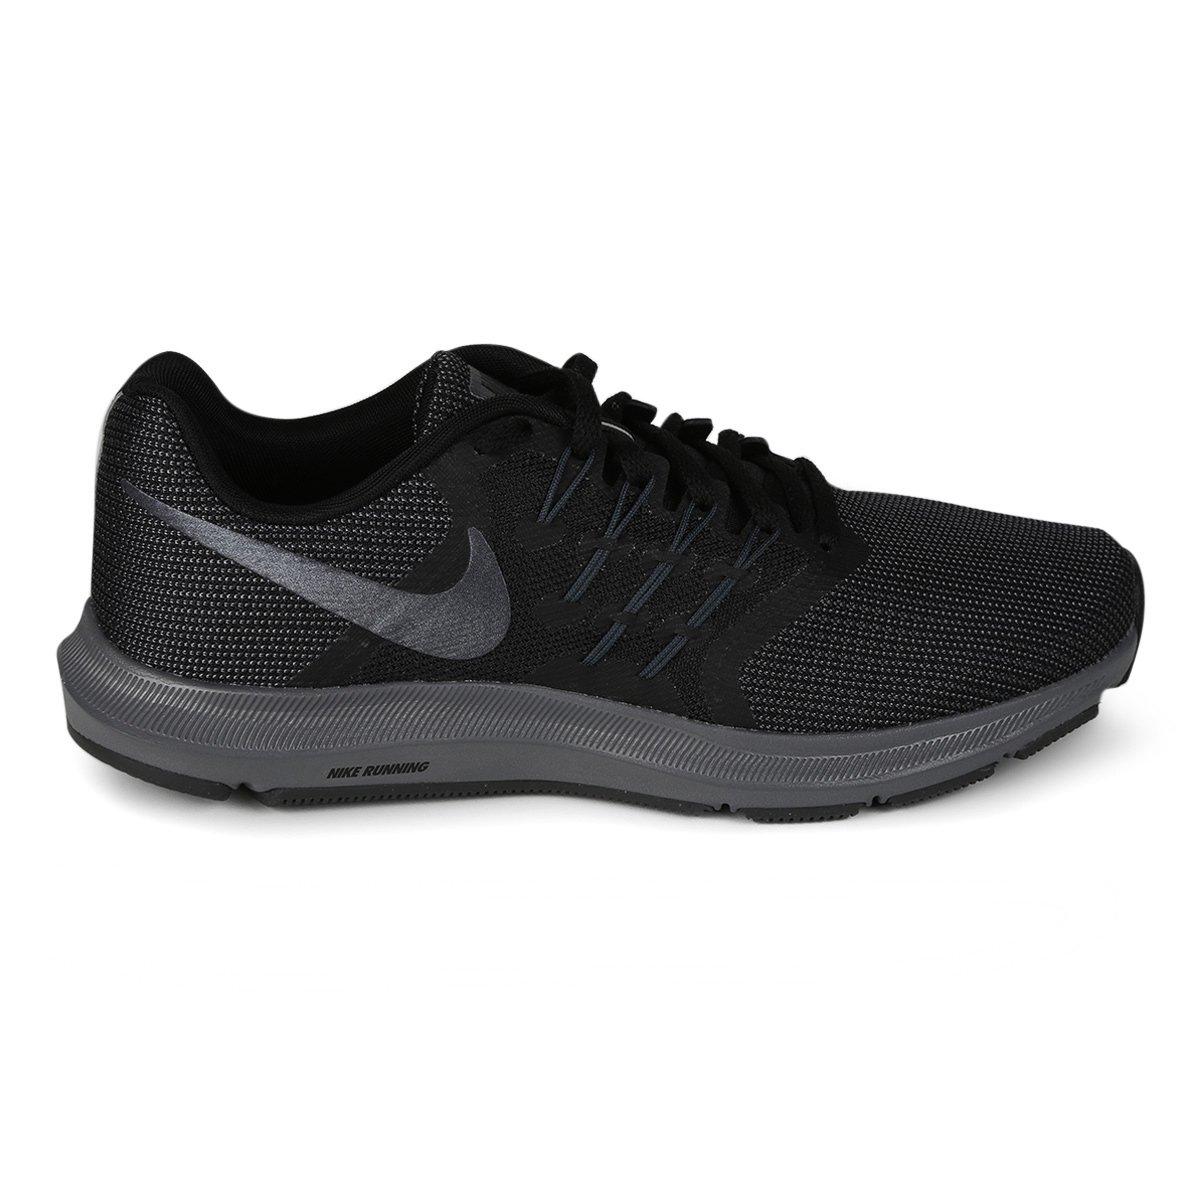 d77773ed1c4 Tênis Masculino Nike Run Swift 908989-010 - Preto Cinza - Botas ...